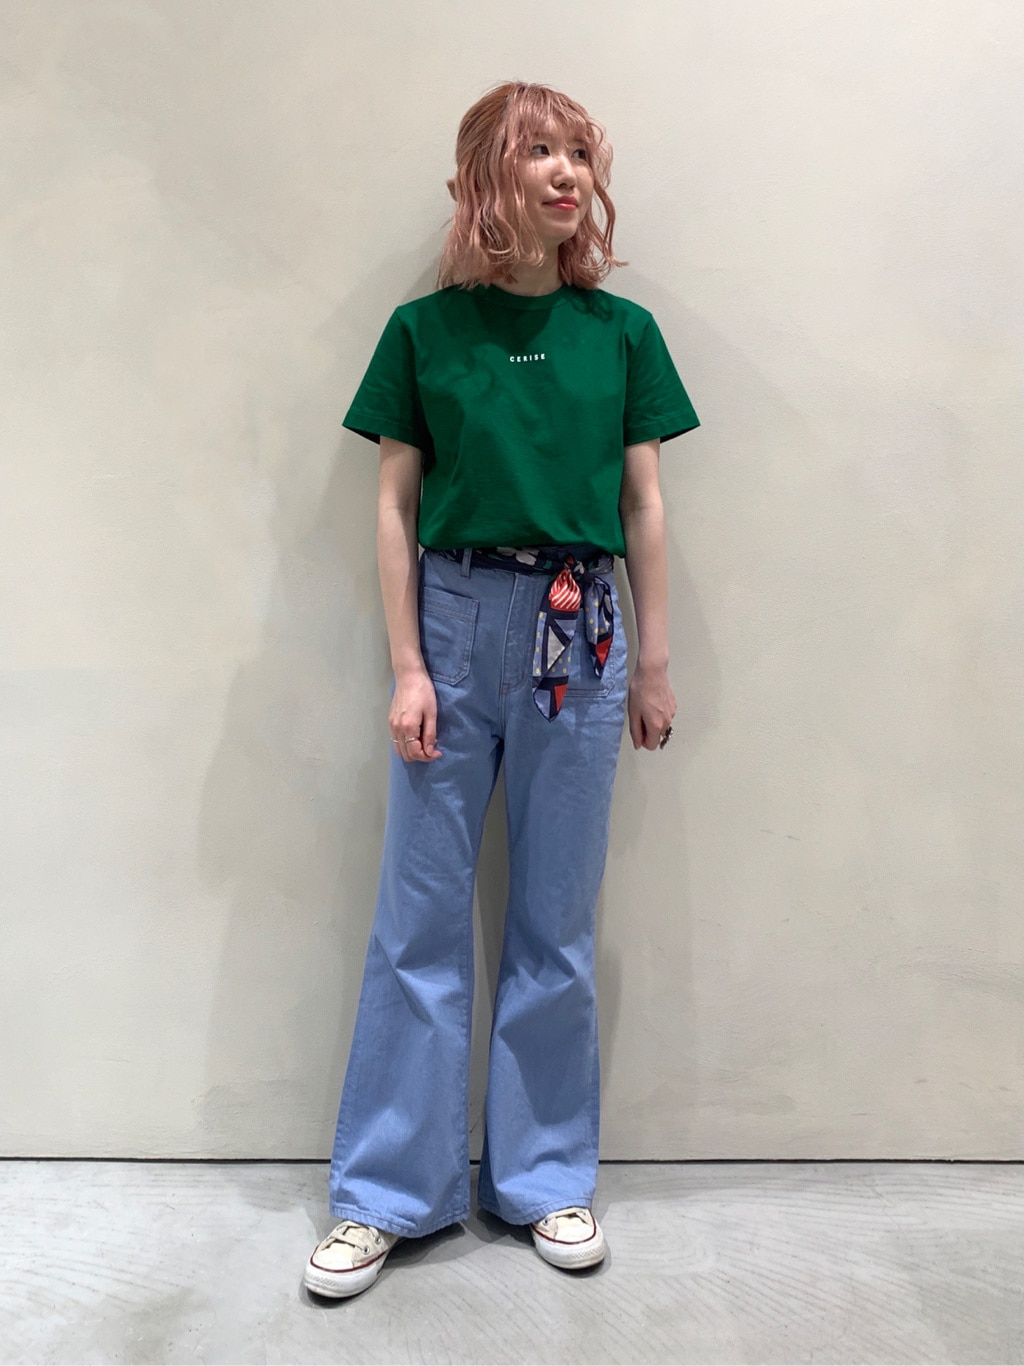 CHILD WOMAN , PAR ICI 東京スカイツリータウン・ソラマチ 2021.05.15